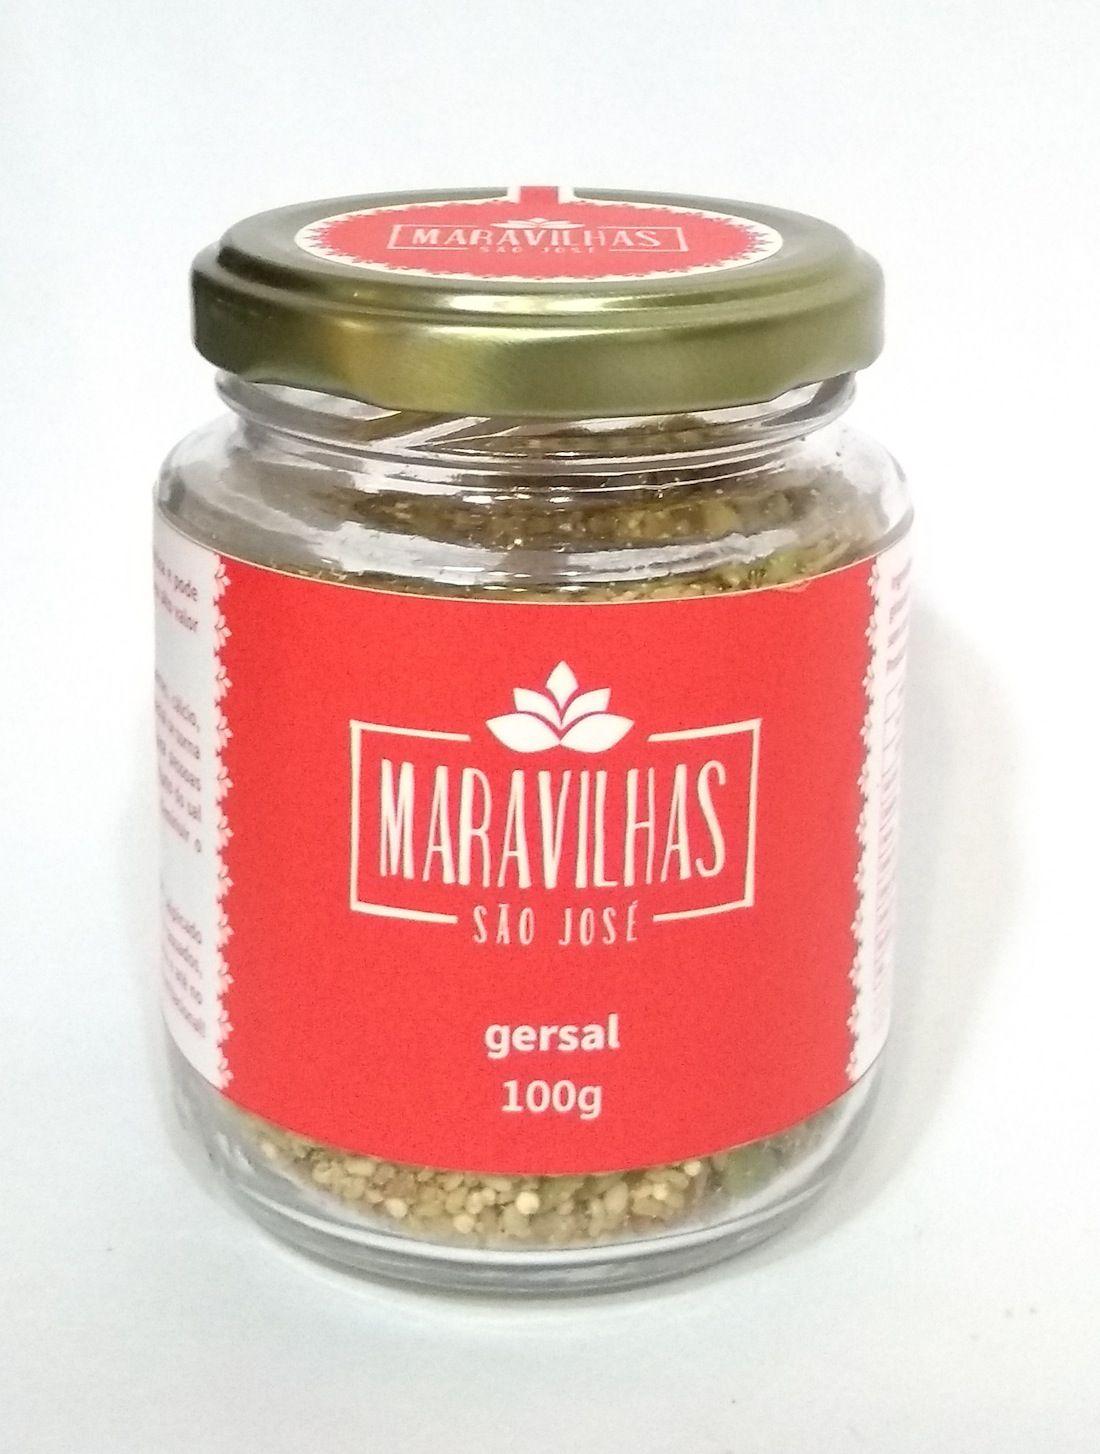 Gersal - Maravilhas São José